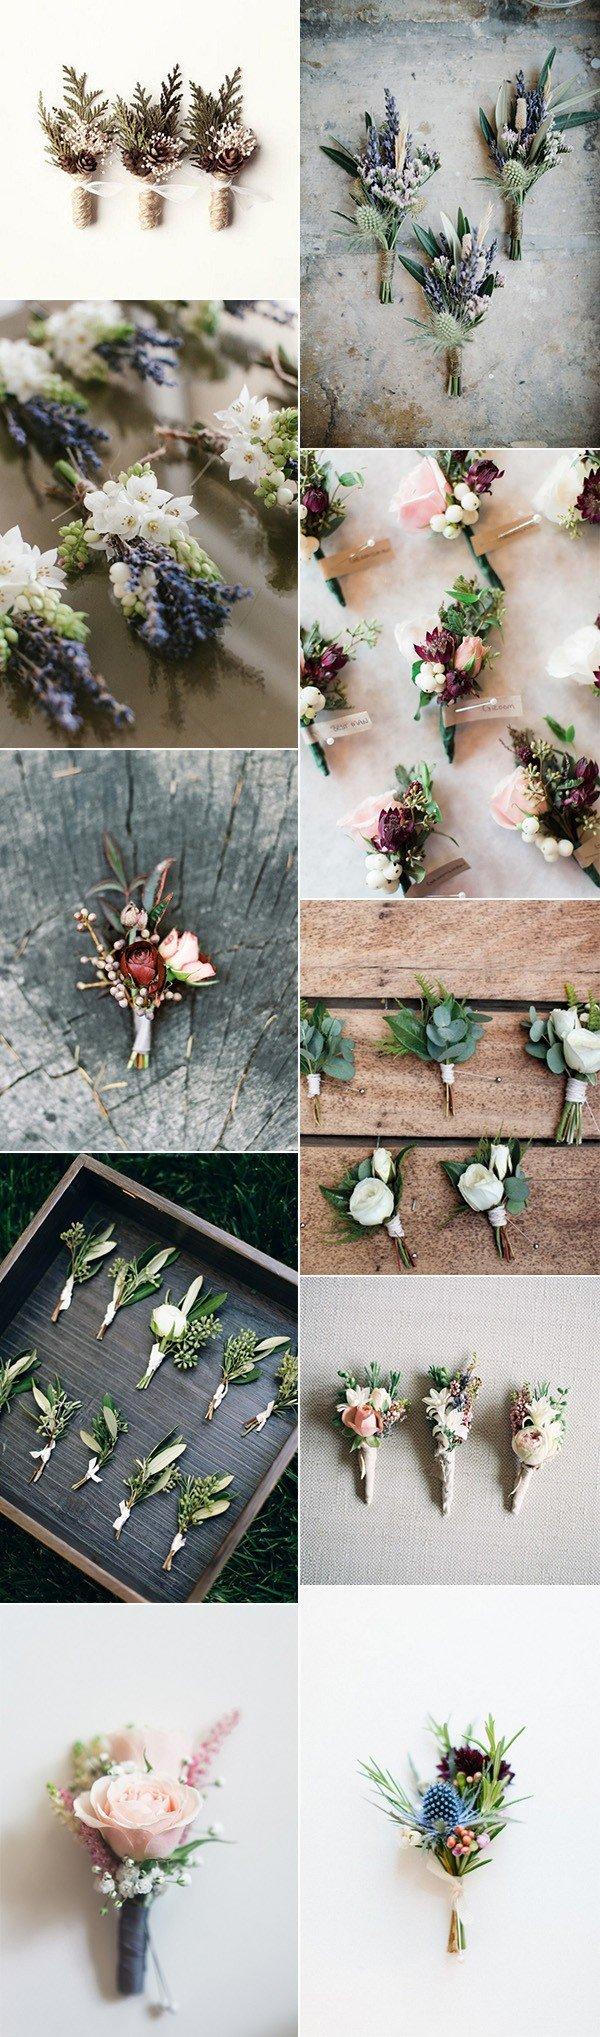 stylish groomsmen wedding boutonniere ideas